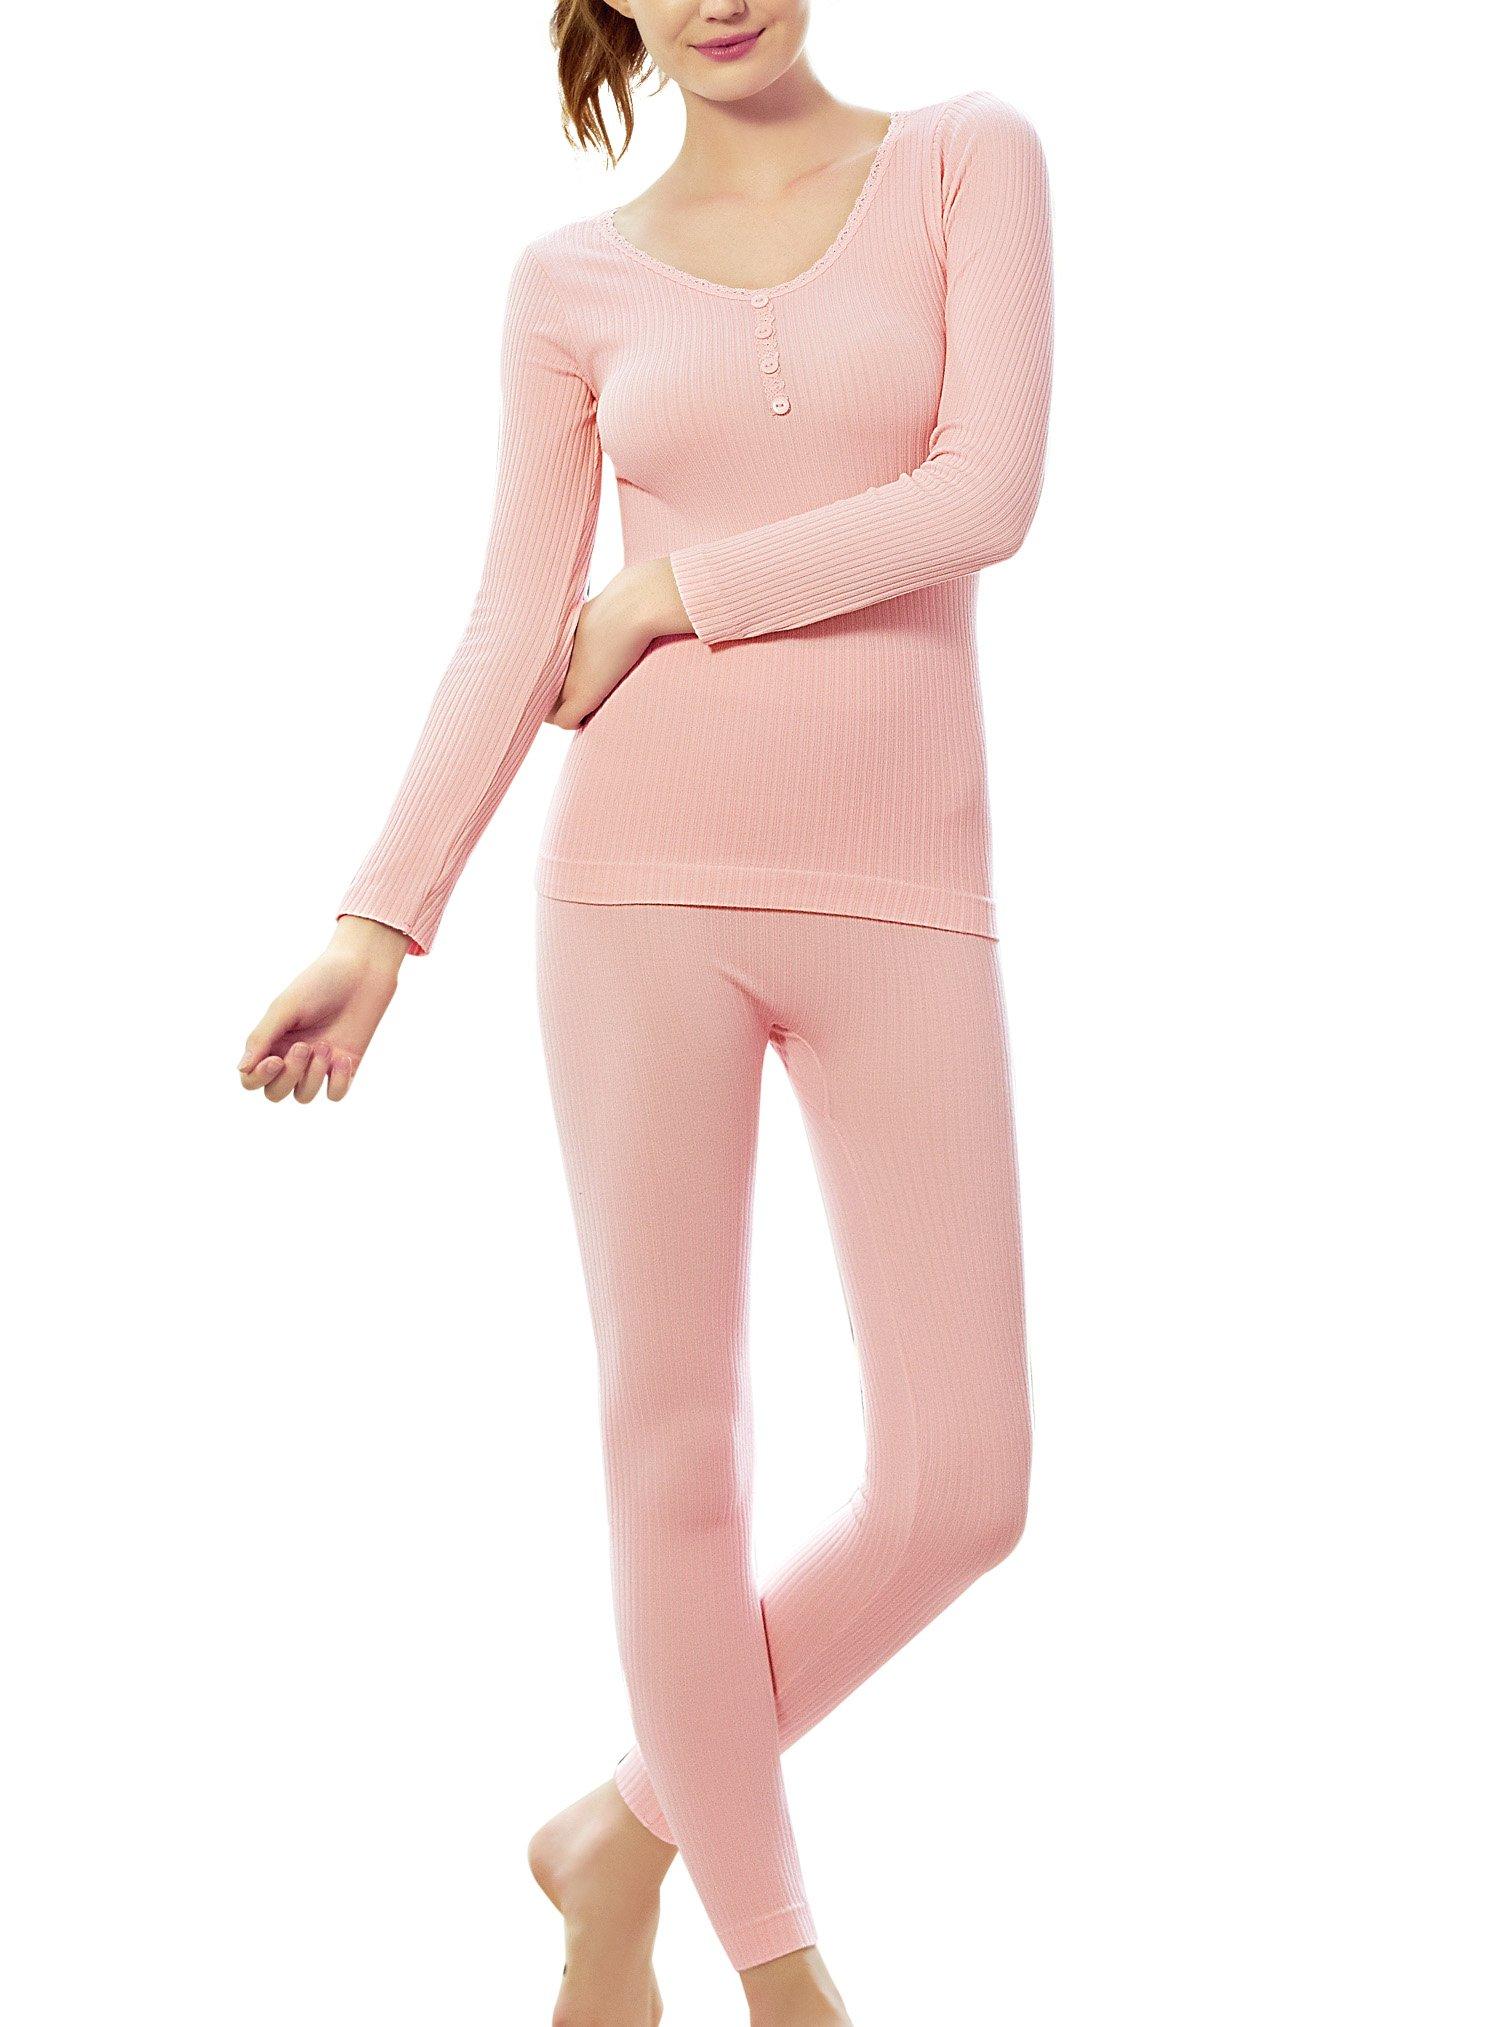 Moonbasa梦芭莎 Womens Long Johns Thermal Set Underwear Bottoms Fleece LinedWinter Base Layering Set (L, Peach Red)